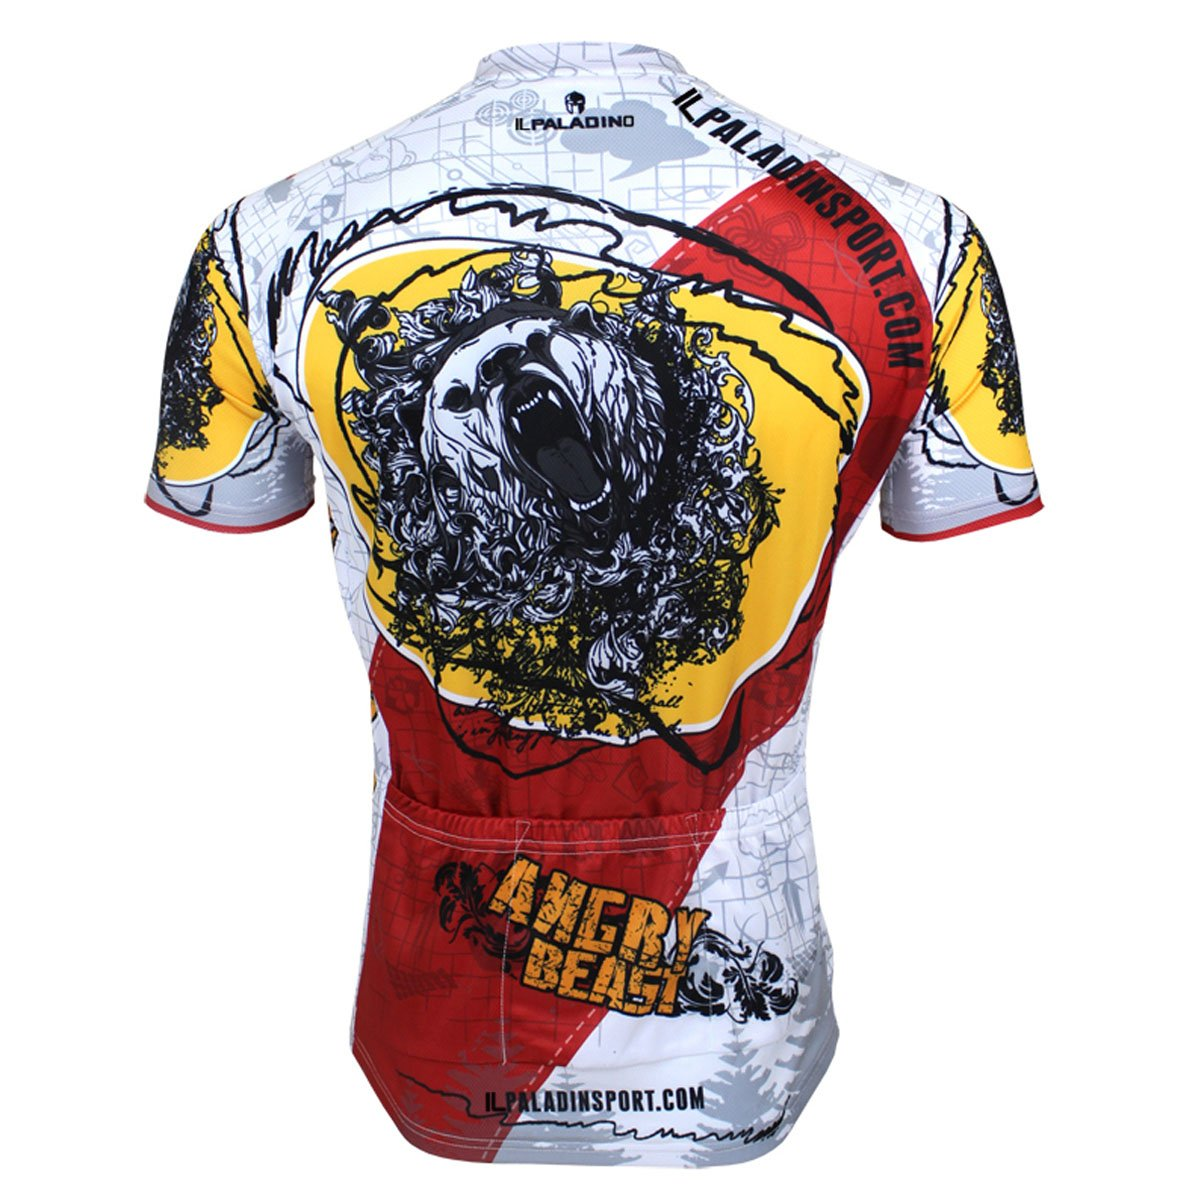 d7d858513 Amazon.com  ILPALADINO Men s Cycling Jersey Short Sleeve Biking Shirts  Animals Pattern  Clothing